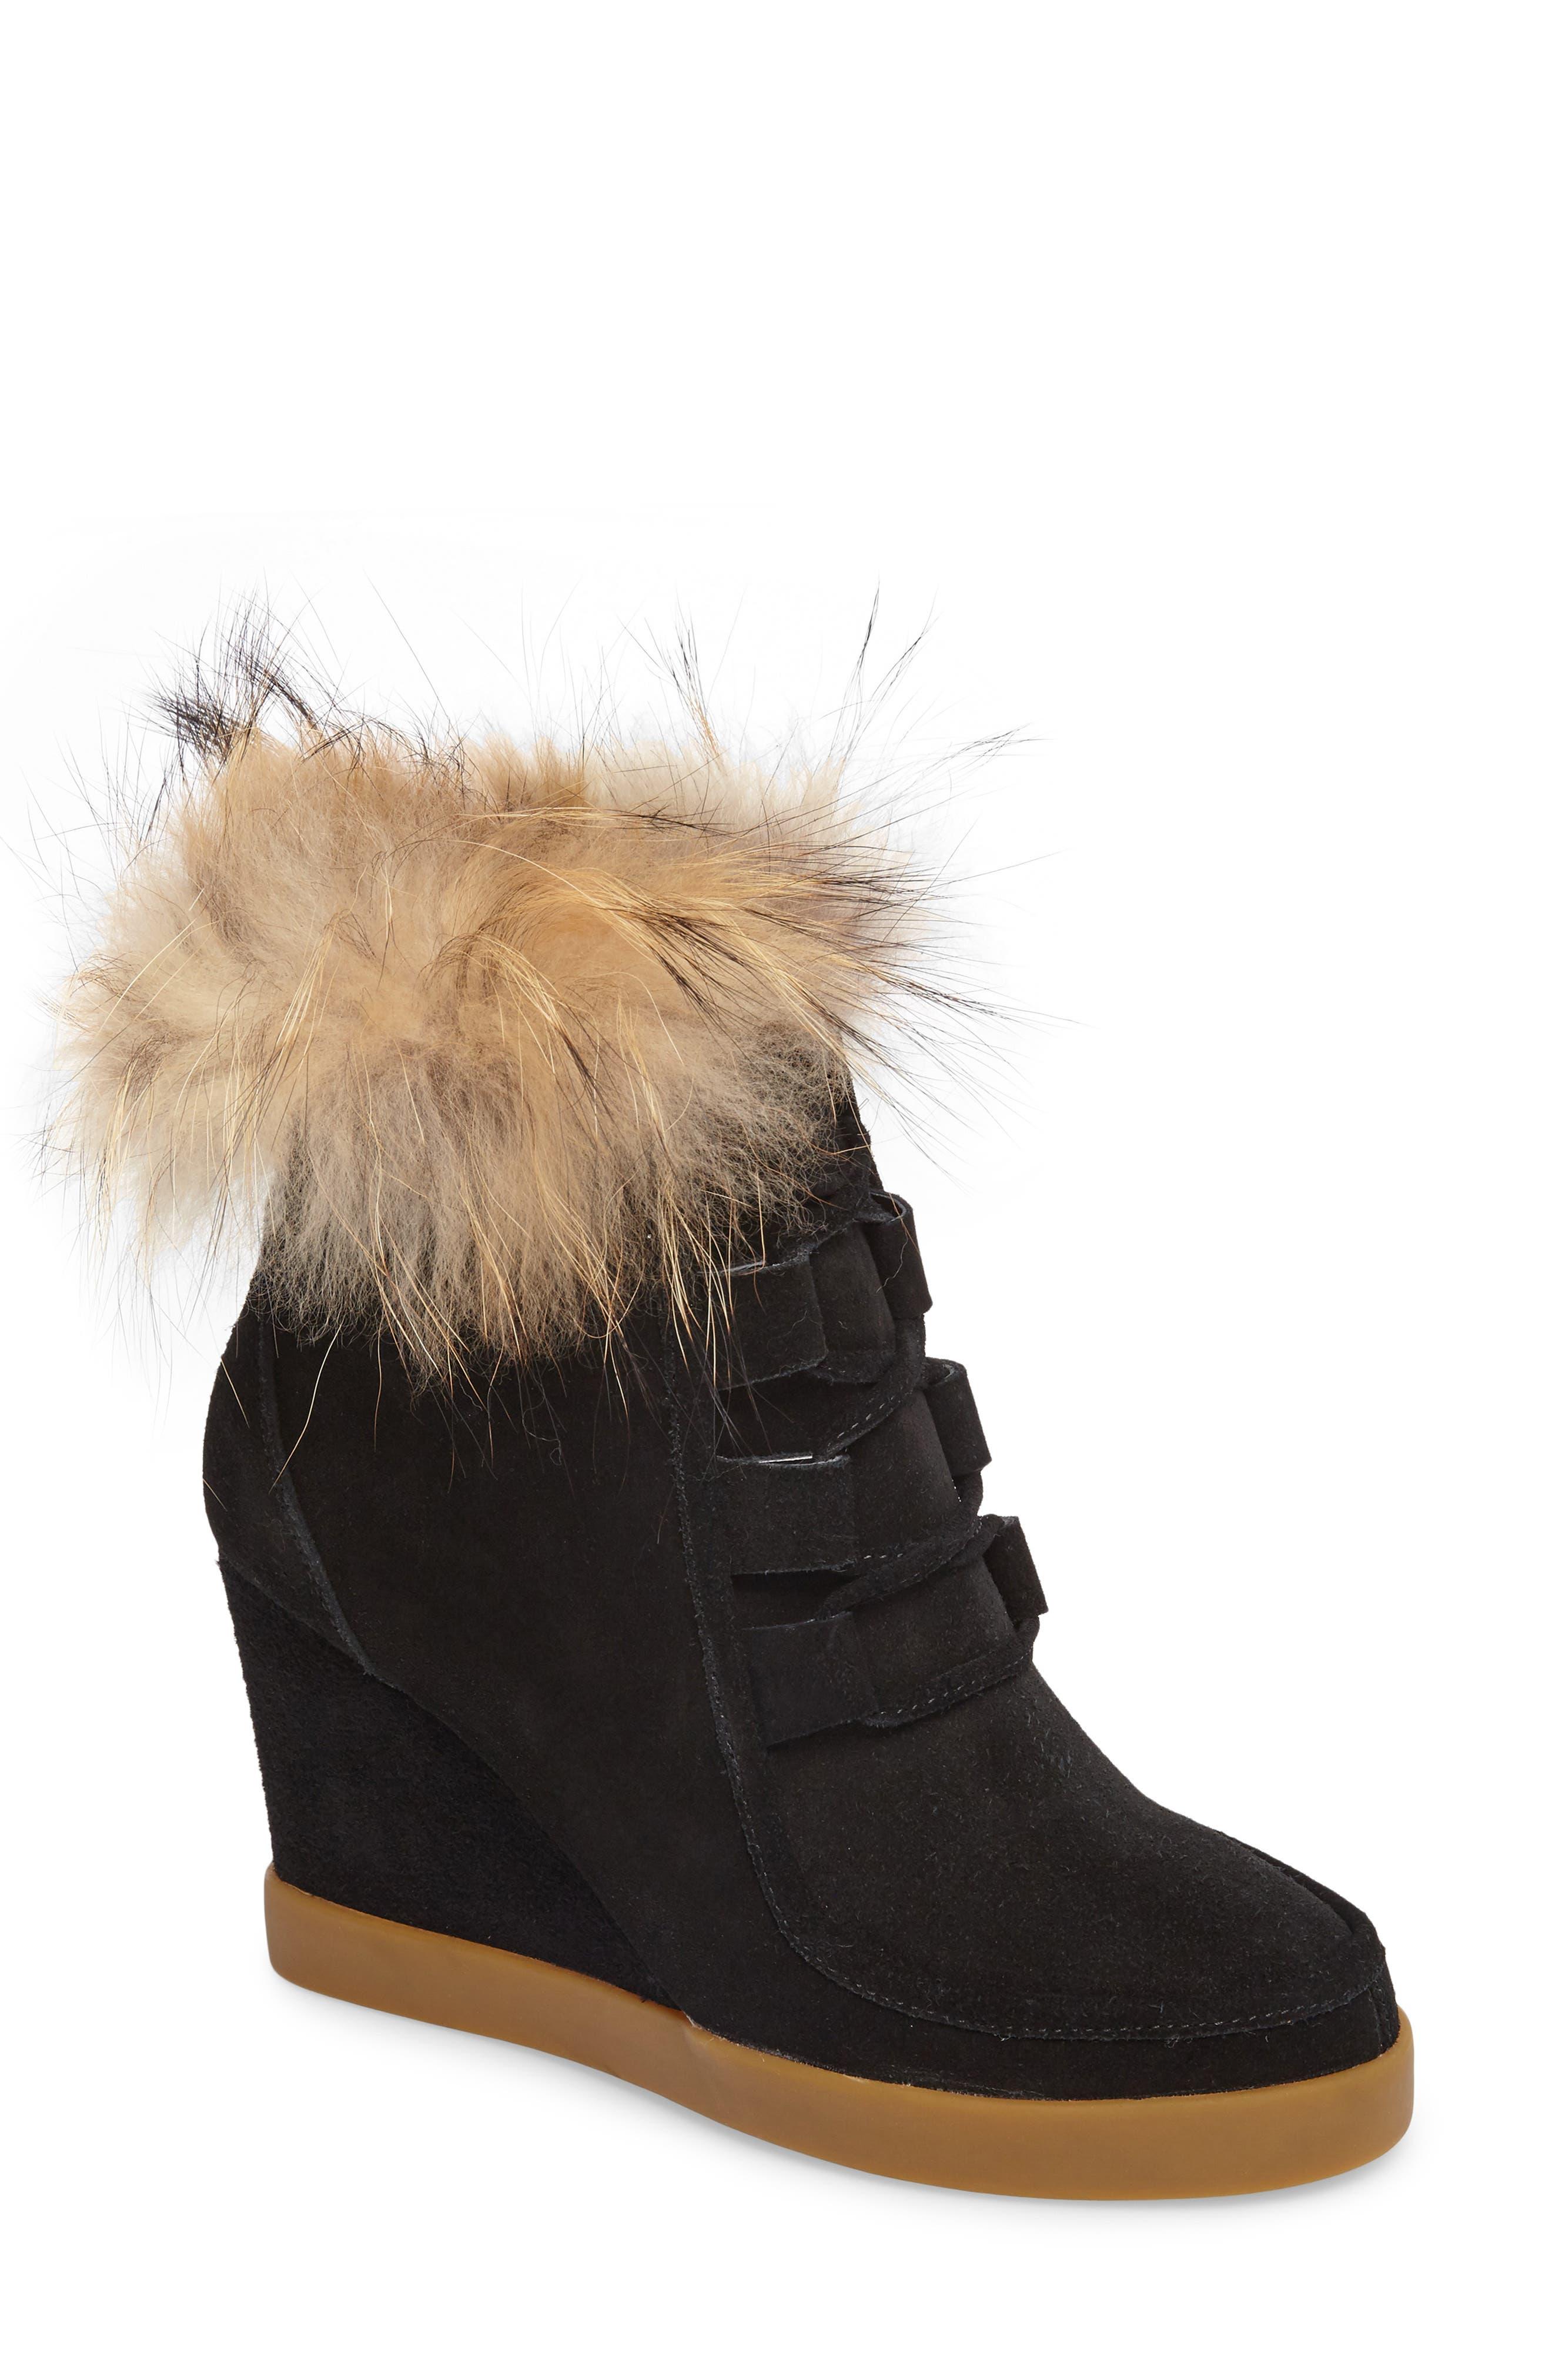 Main Image - Cecelia New York Holly Wedge Bootie with Genuine Fox Fur Trim (Women)